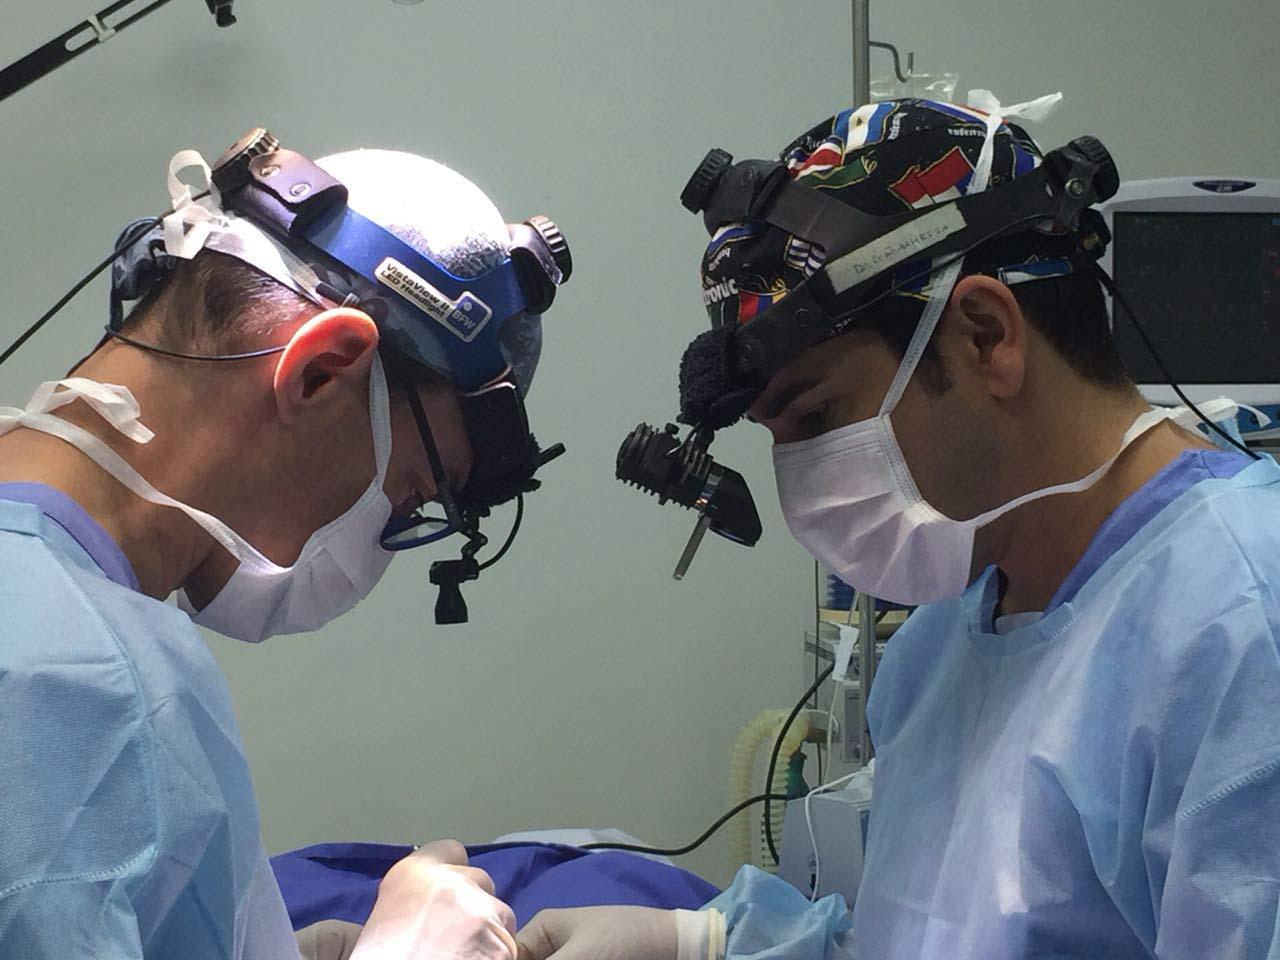 Cirurgia de frontoplastia + blefaroplastia + rinoplastia + lipoescultura facial com Dr. Jurado